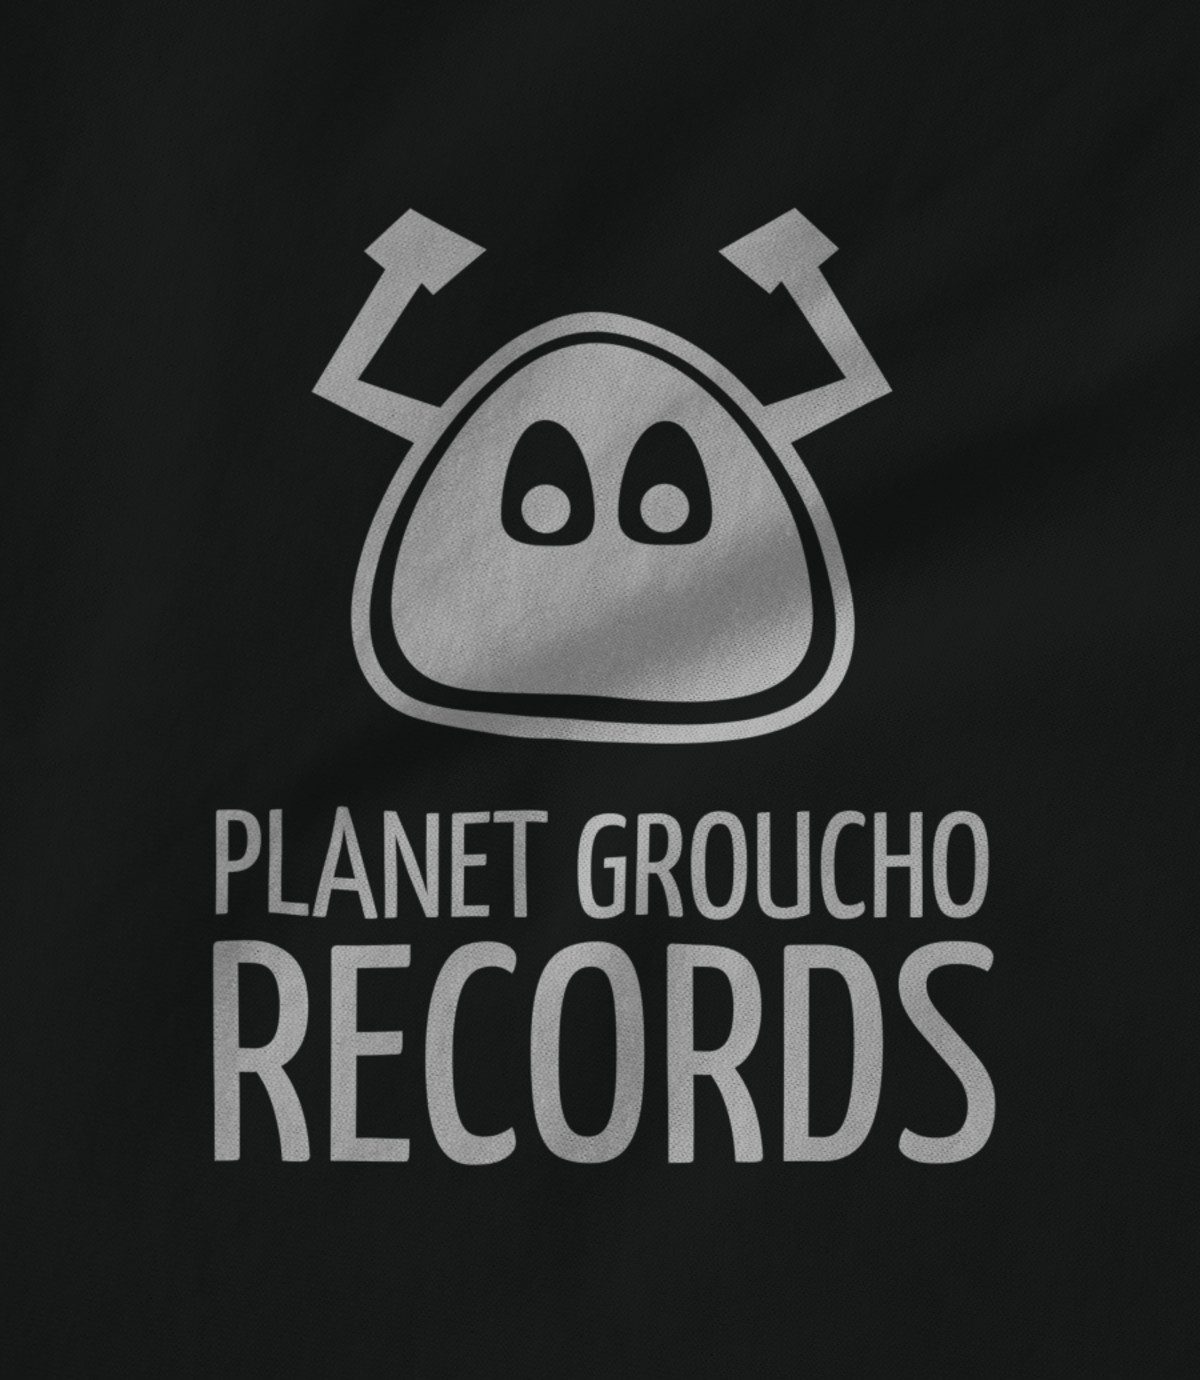 Planet groucho records planet groucho records logo tee a4geoc